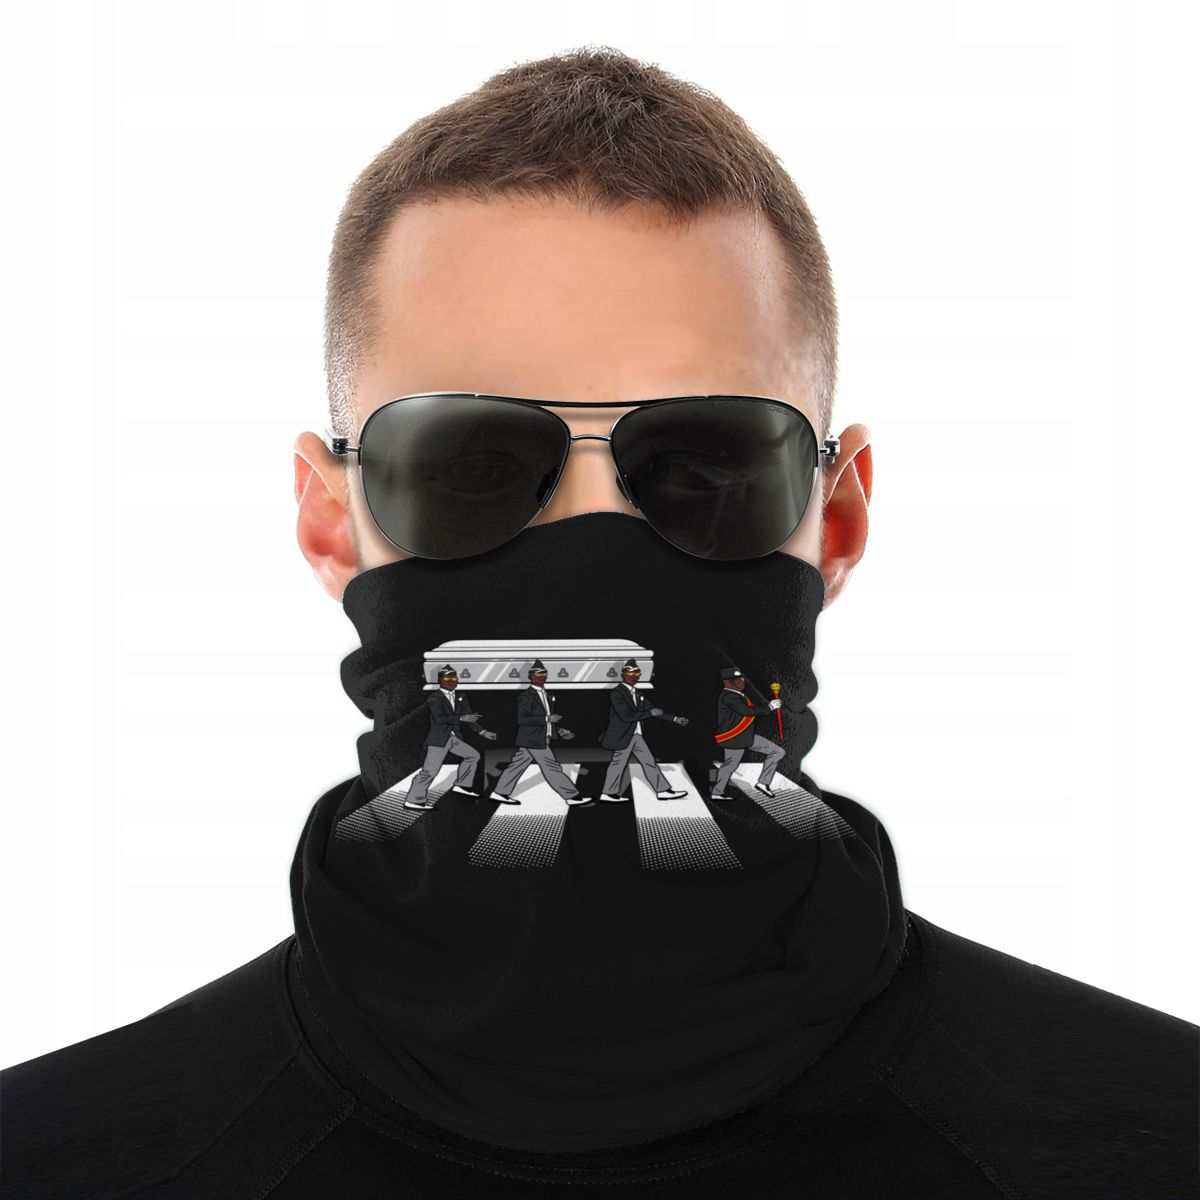 Coffin Dance Scarves Half Face Mask Unisex Fashion Neck Gaiter Africa Black Neck Bandanas Windproof Headband Biking Hiking